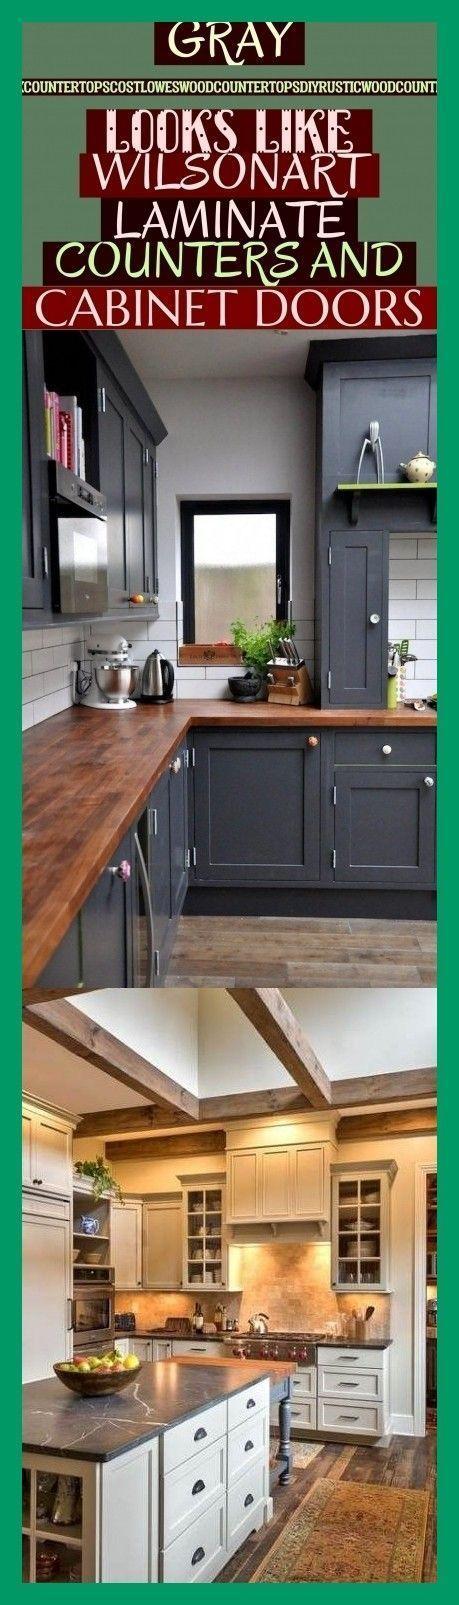 Graue Kuchenschranke Metzger Block Arbeitsplatten Kosten Lowes Holz Arbeitsplatten Diy Grey Kitchen Cabinets Butcher Block Countertops Cost Kitchen Cabinets